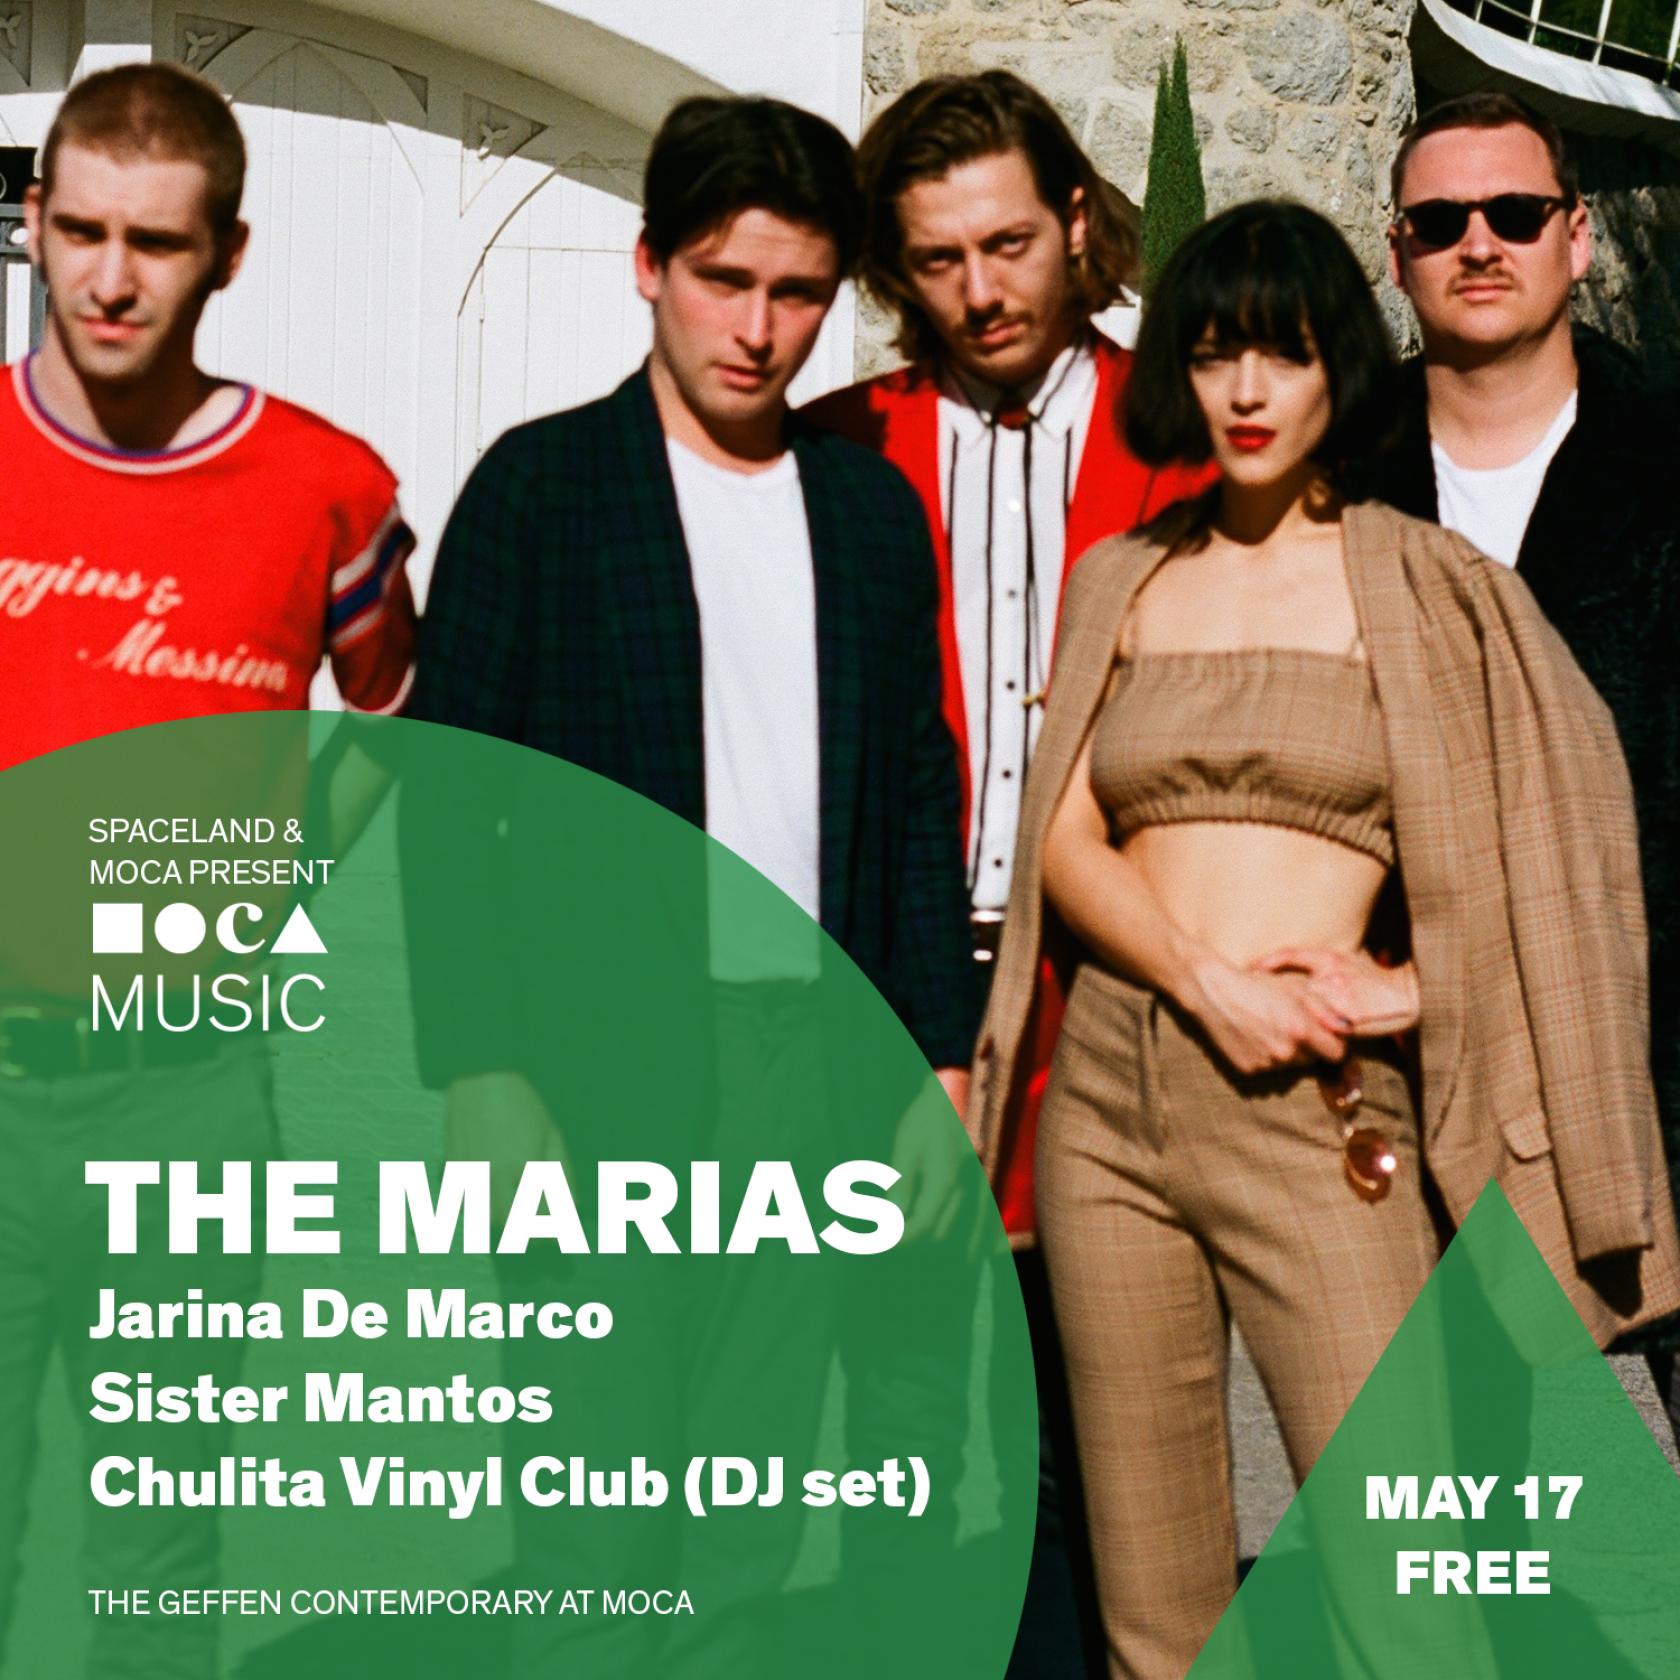 MOCA Music: THE MARIAS, Jarina De Marco, Sister Mantos, and Chulita Vinyl Club